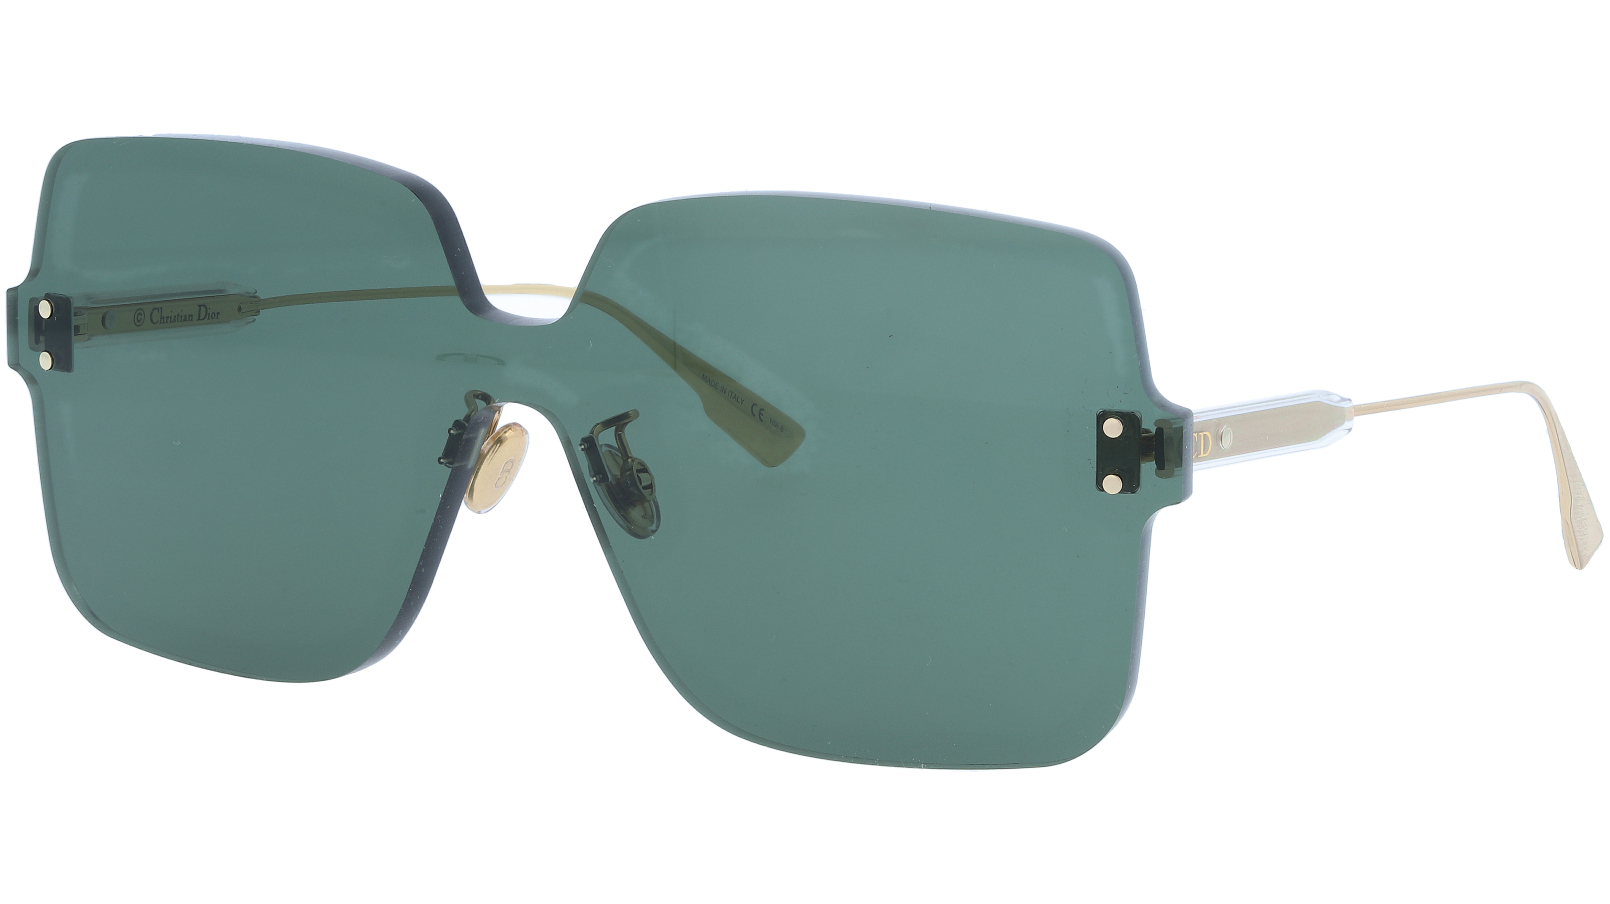 DIOR DIORCOLORQUAKE1 1EDQT GREEN Sunglasses